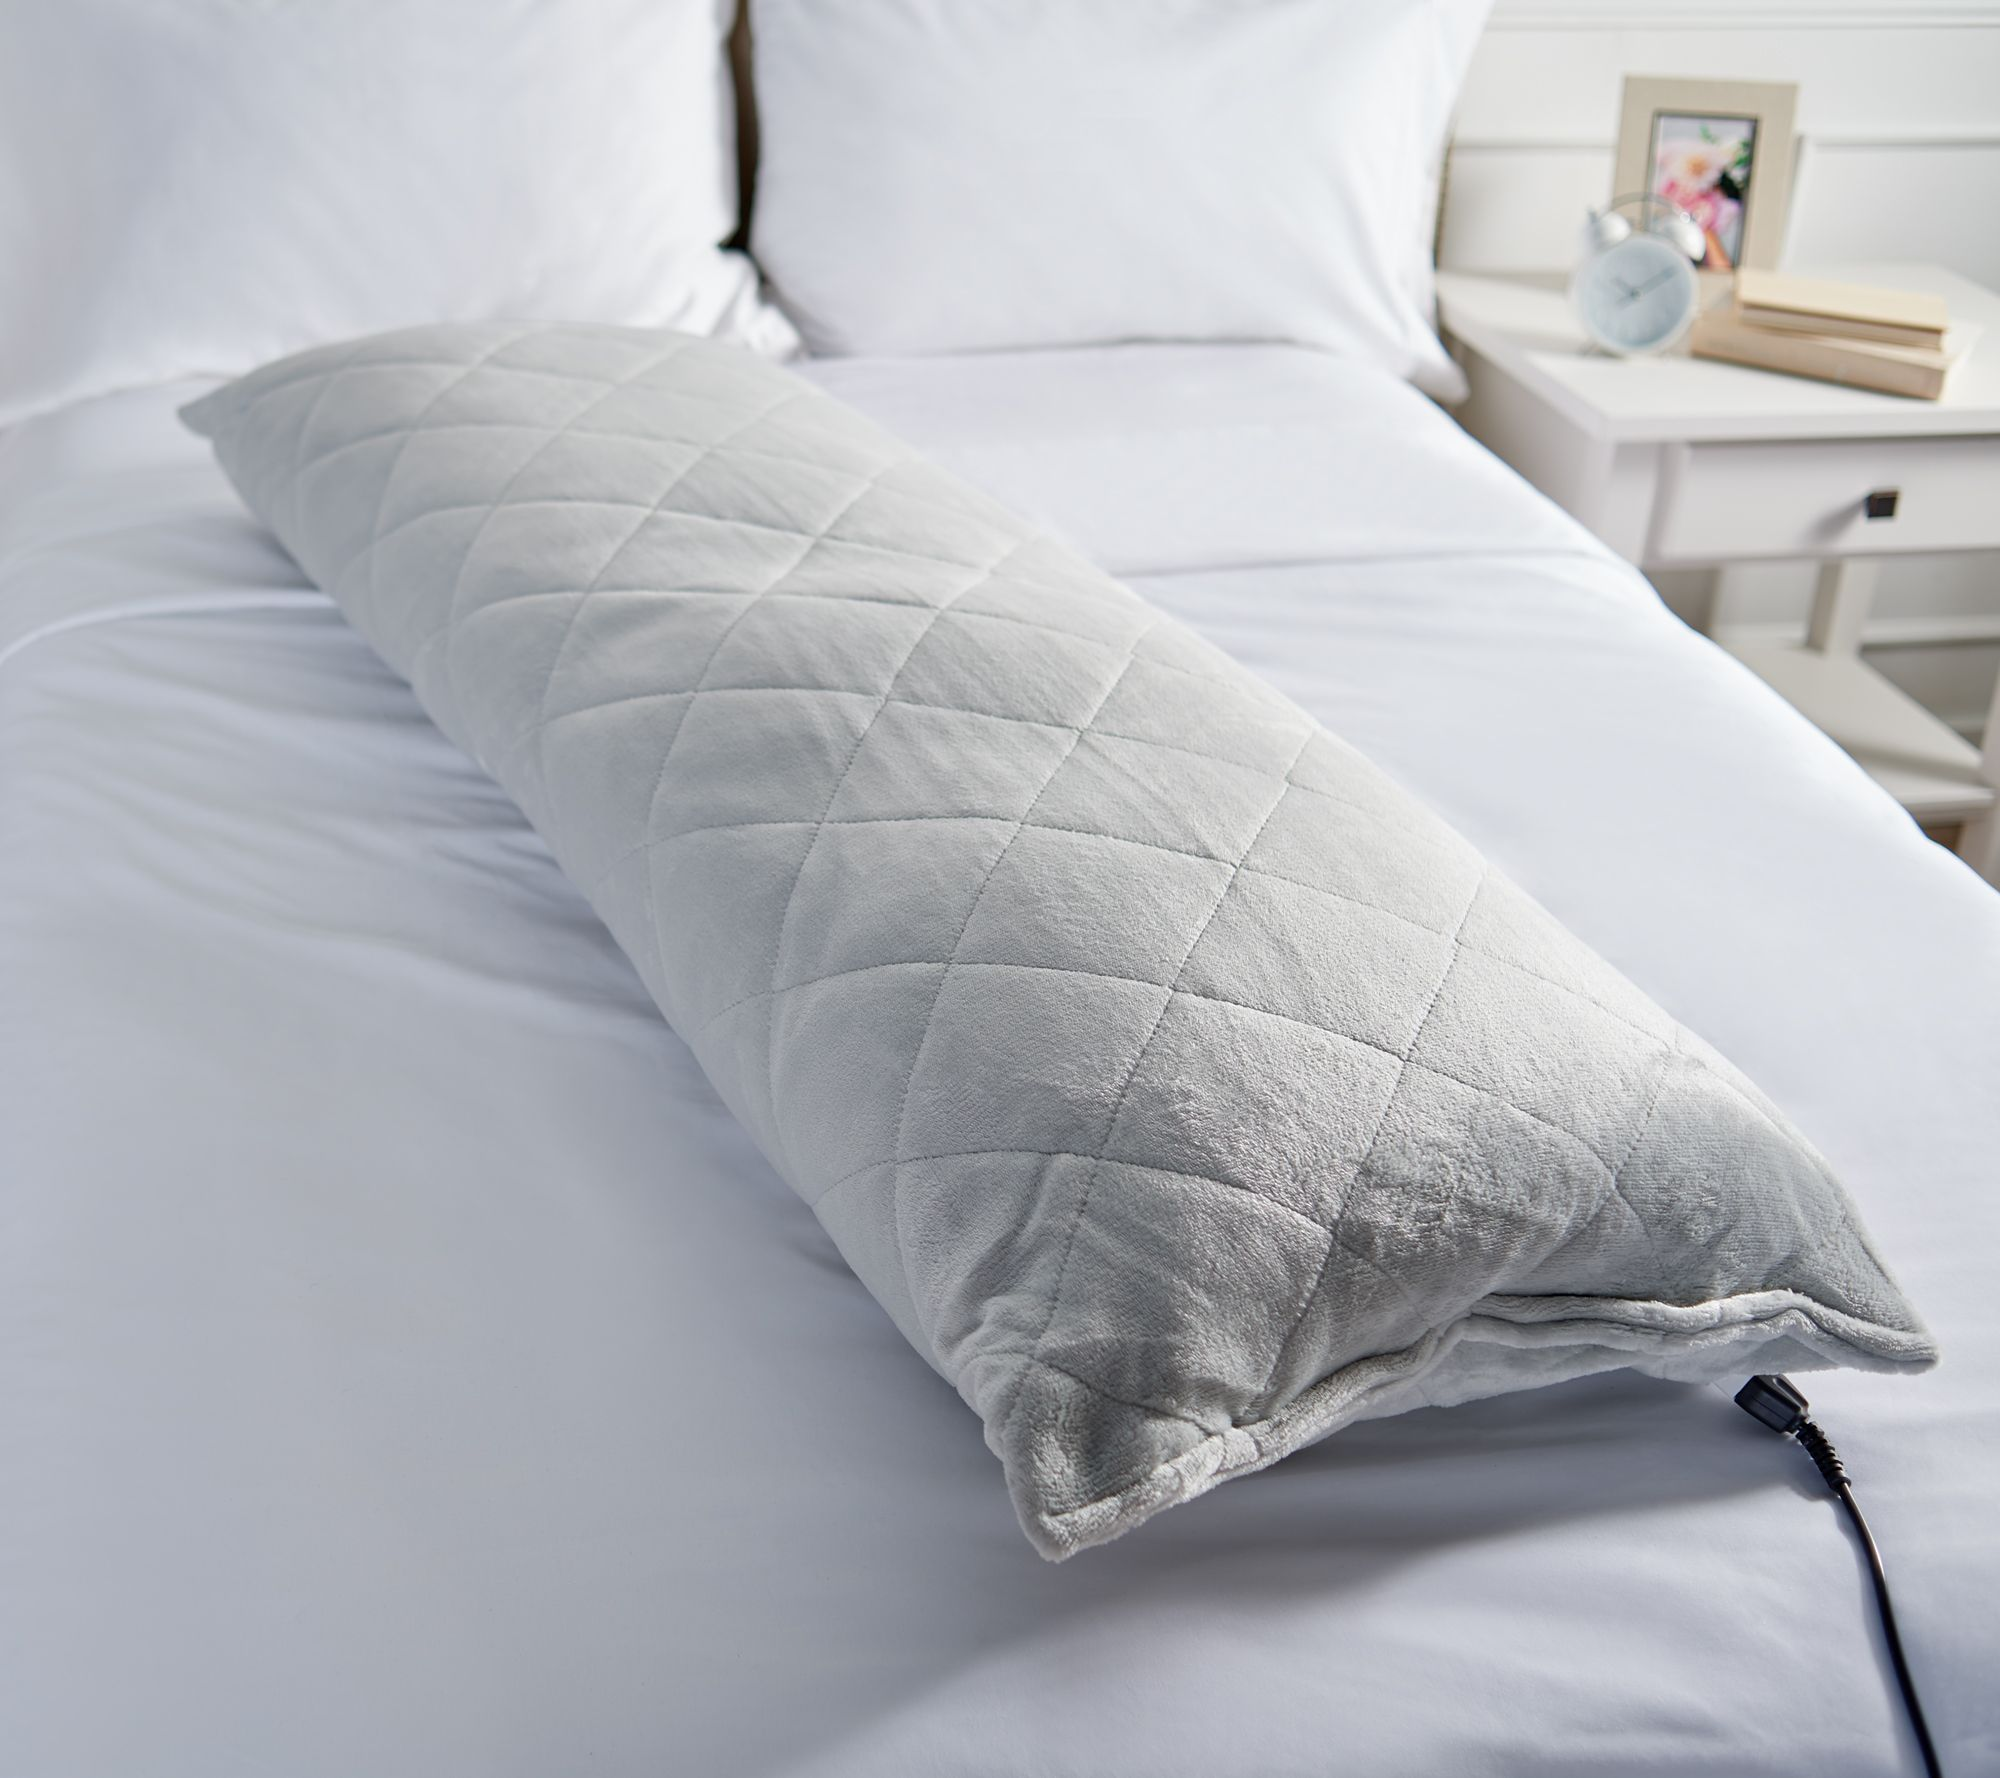 ugg body pillow reviews online